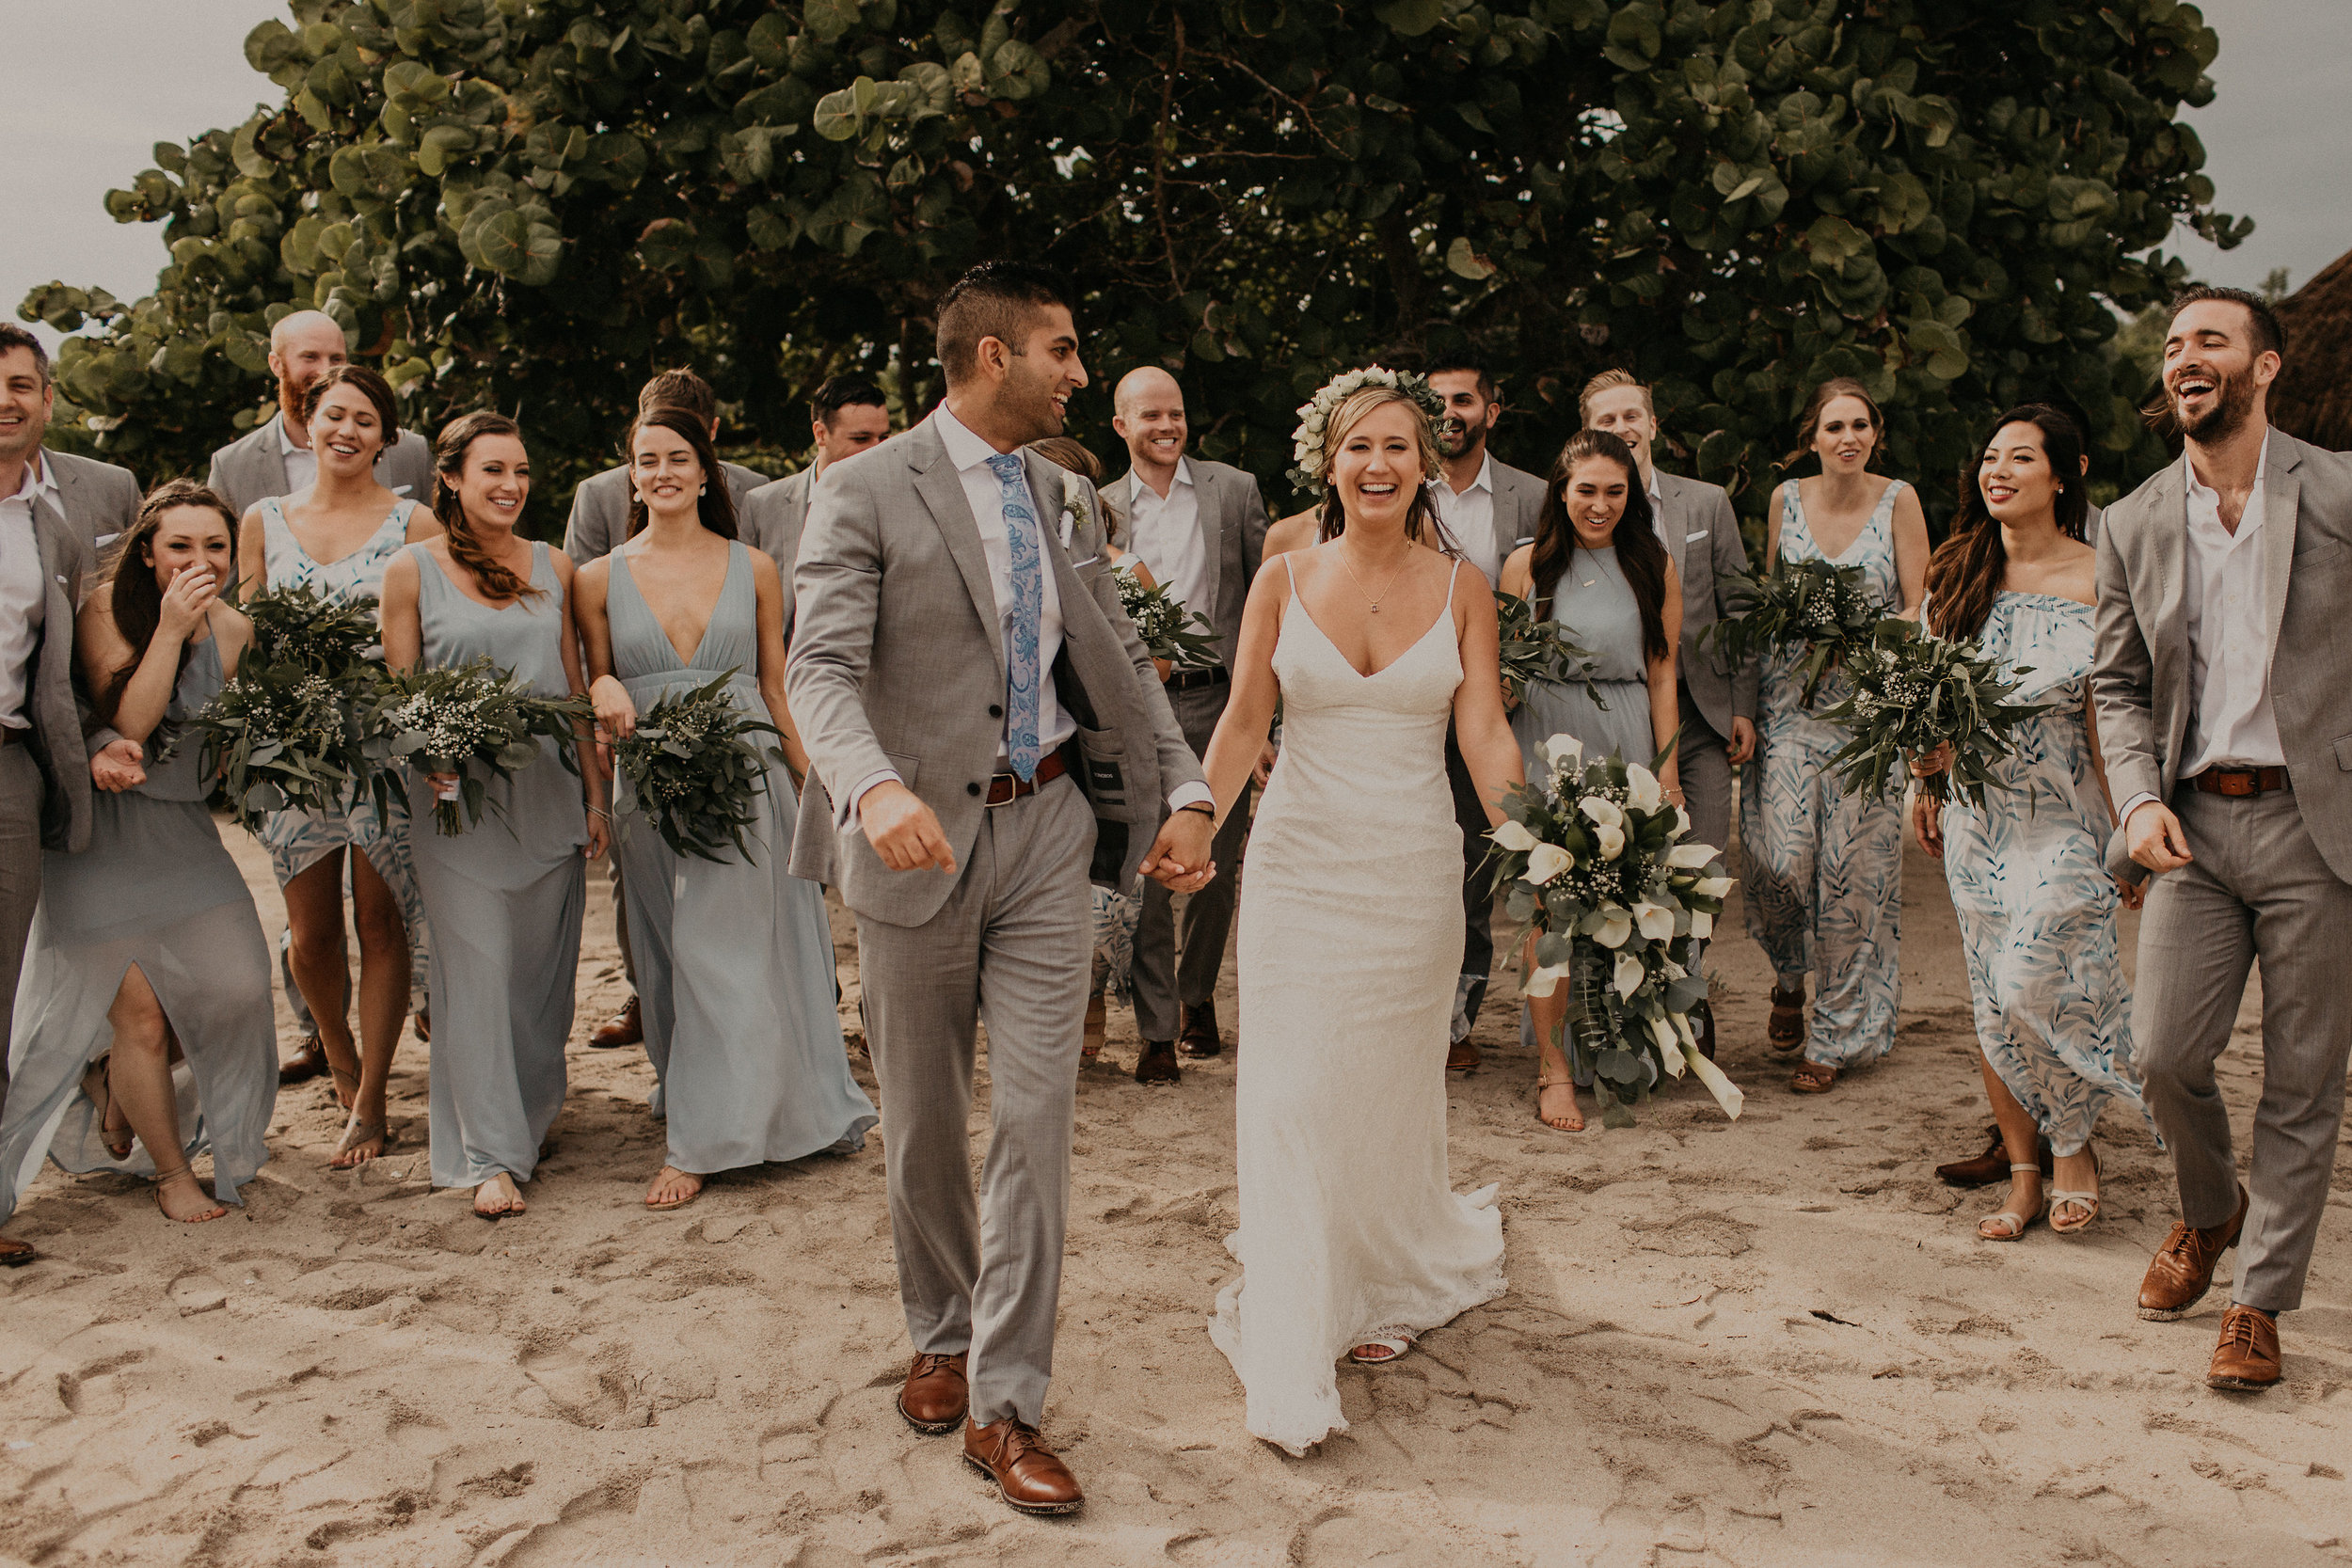 Playa-del-Carmen-Wedding-427.jpg